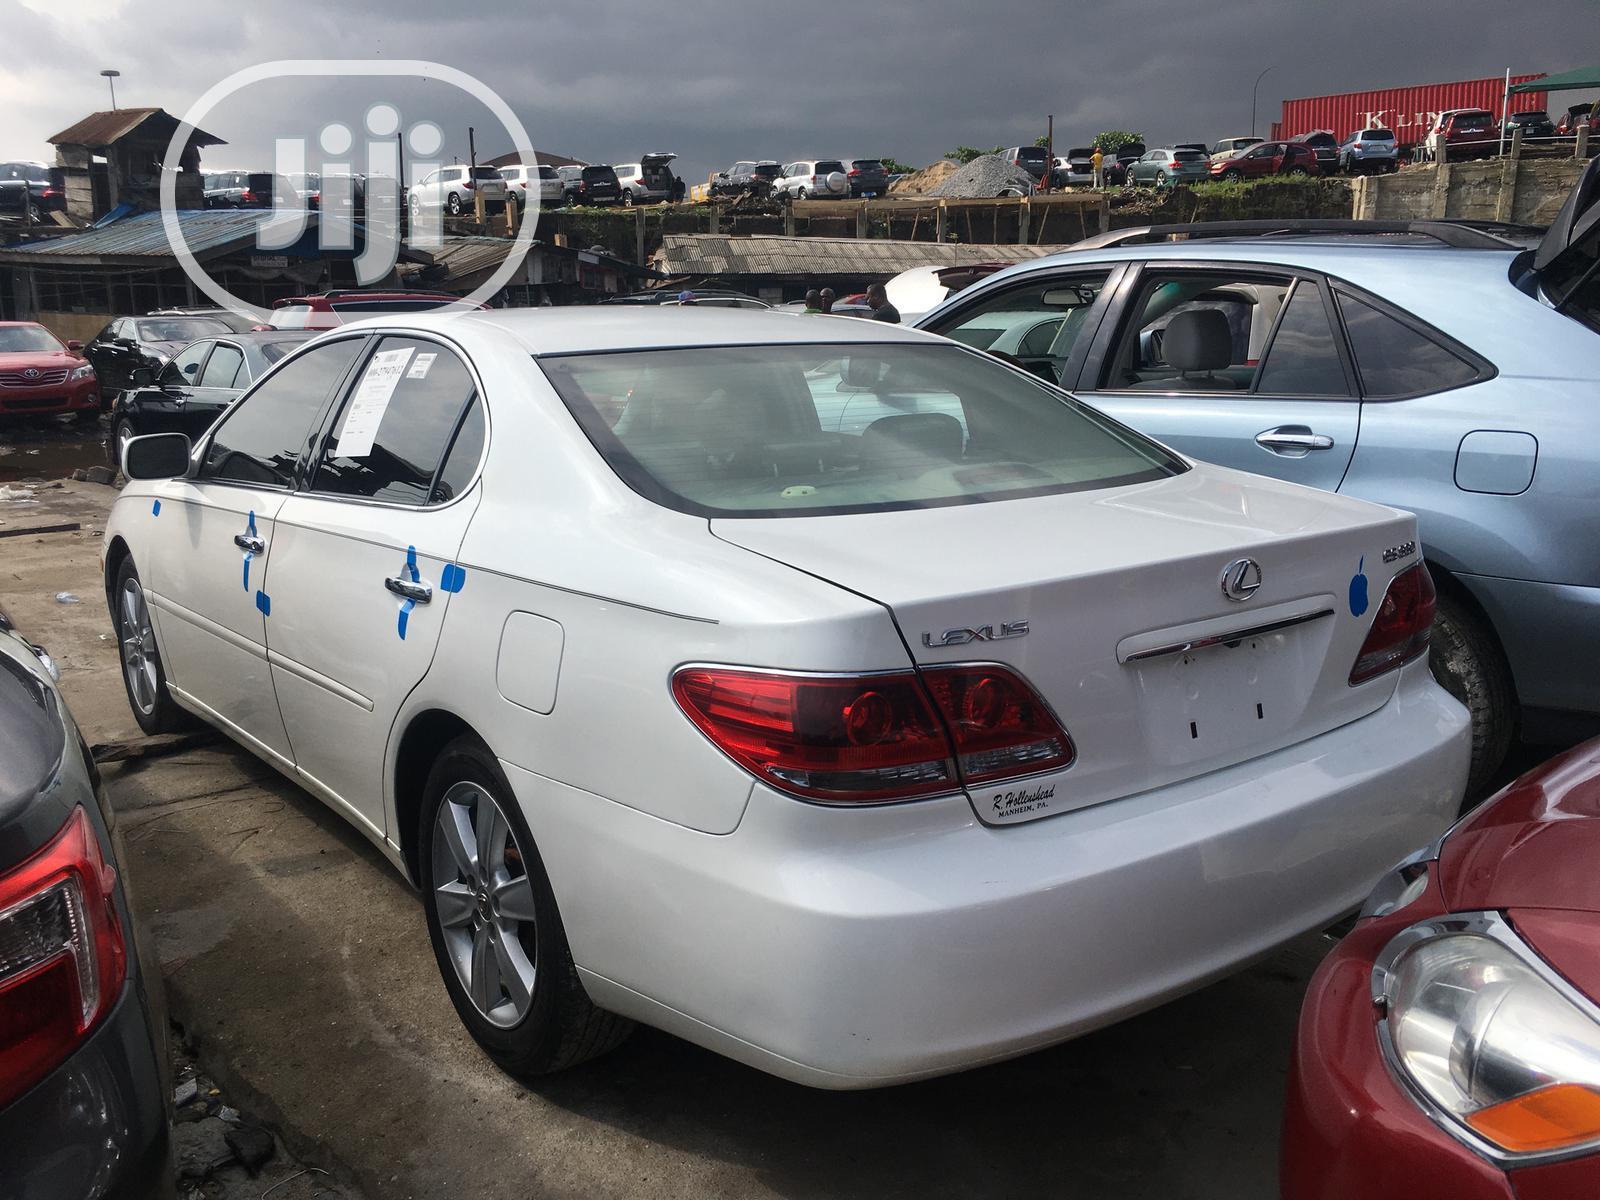 Lexus ES 330 2005 White | Cars for sale in Apapa, Lagos State, Nigeria